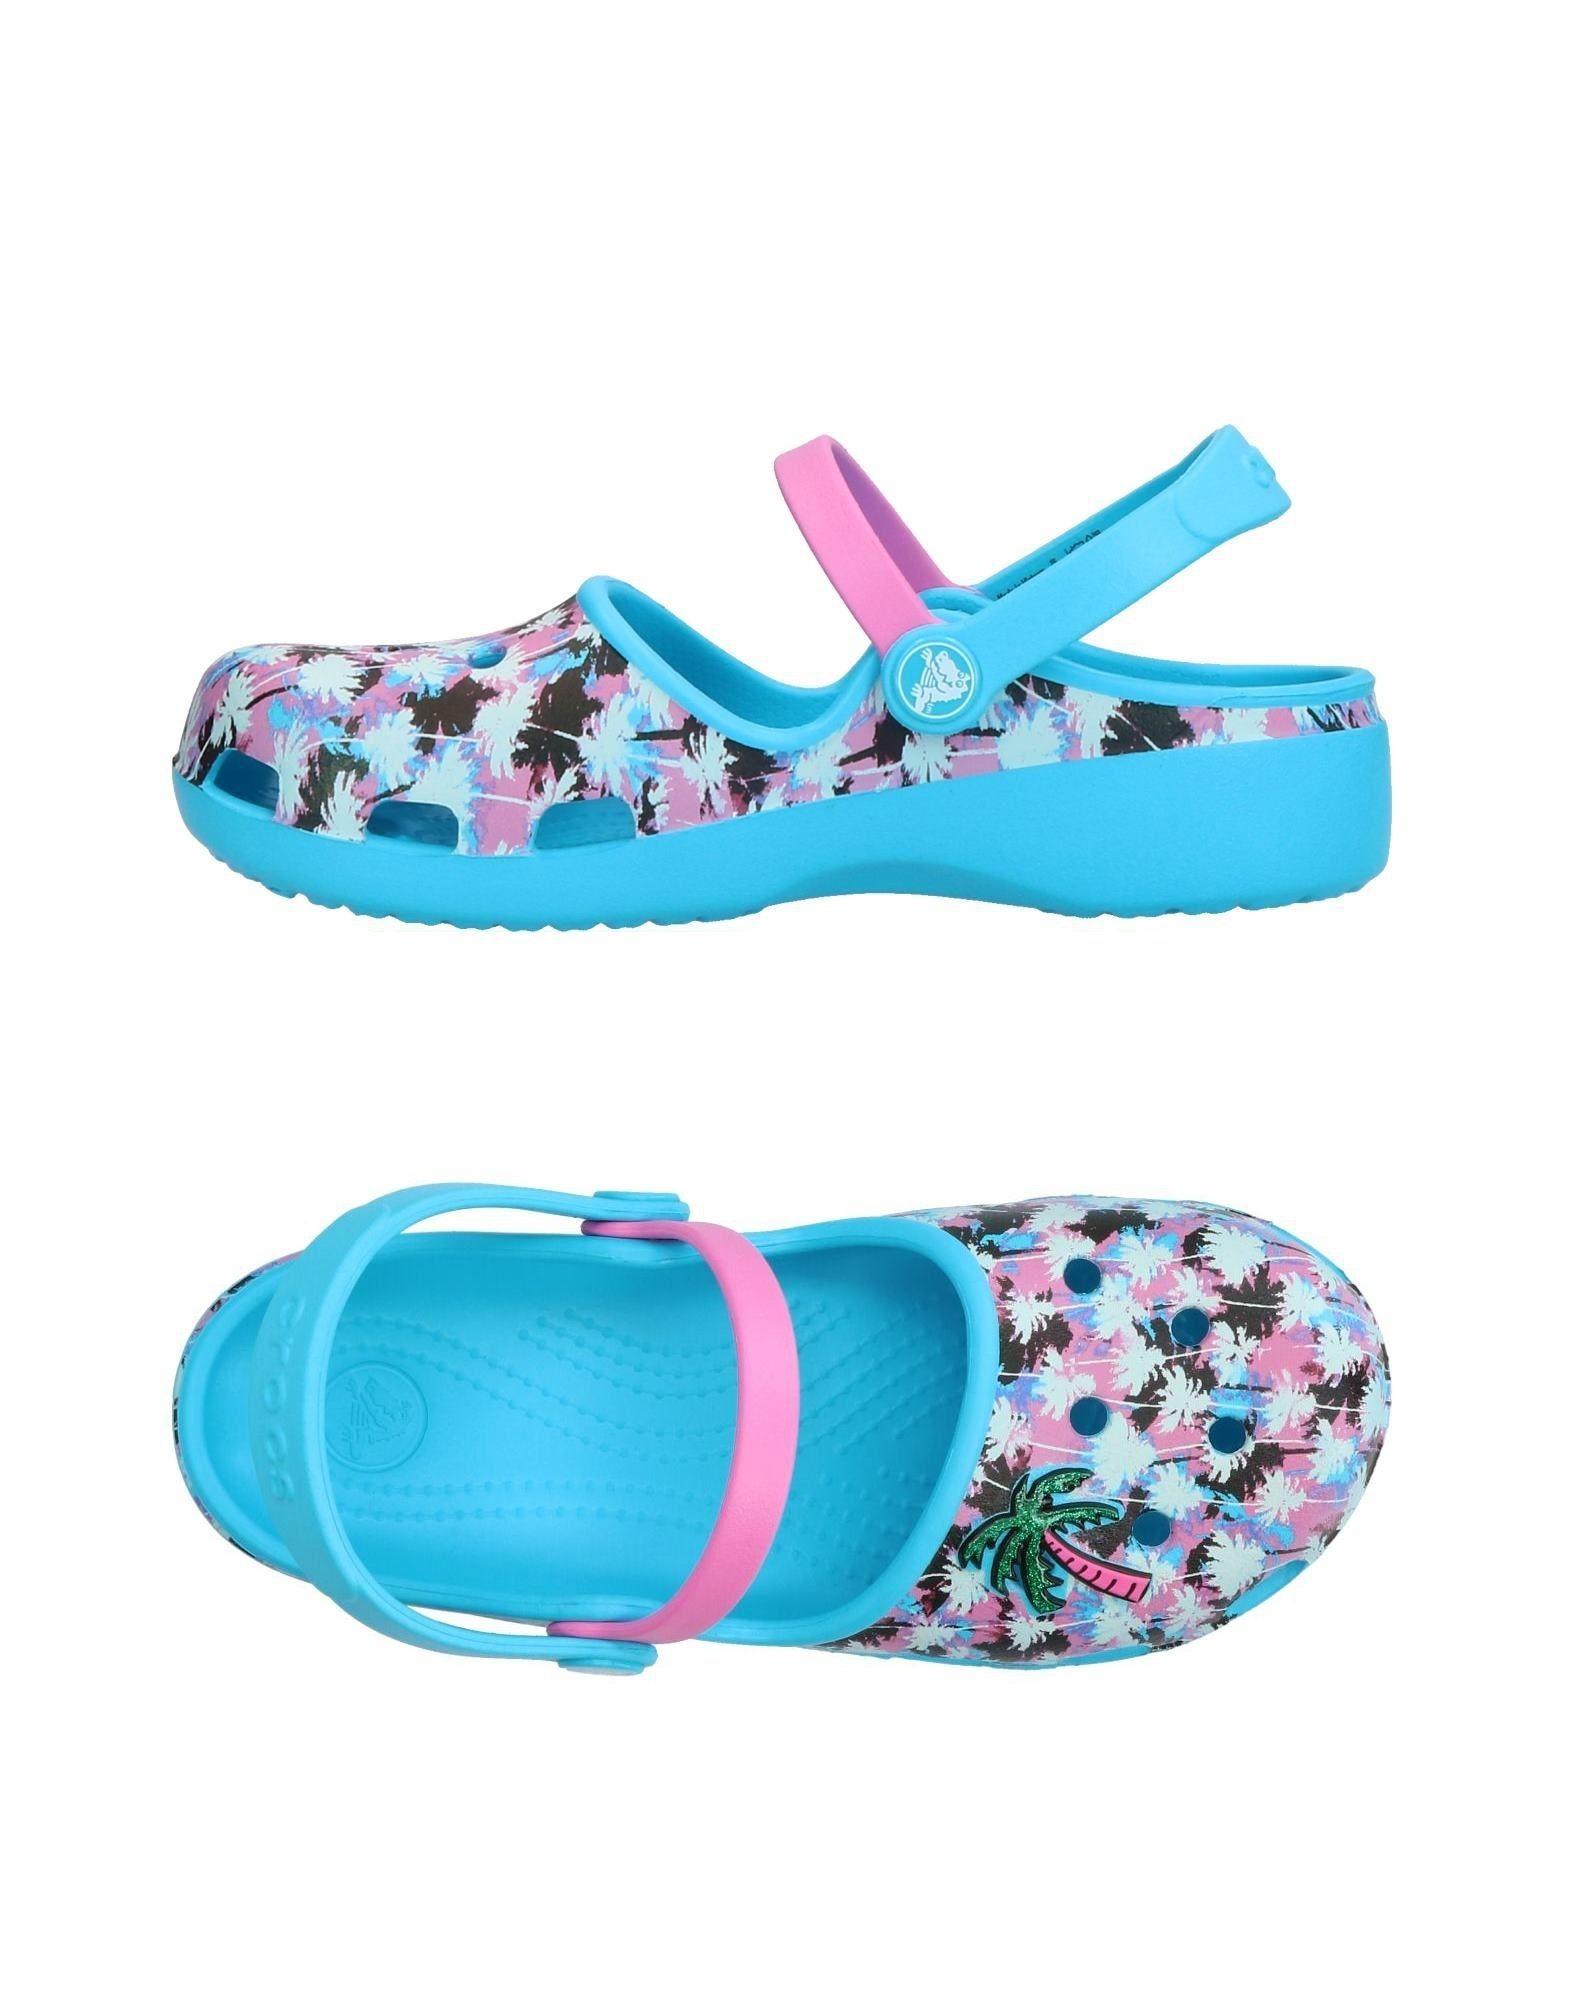 b4a9dfe39 Azure Crocs Shoes online - Mauritius